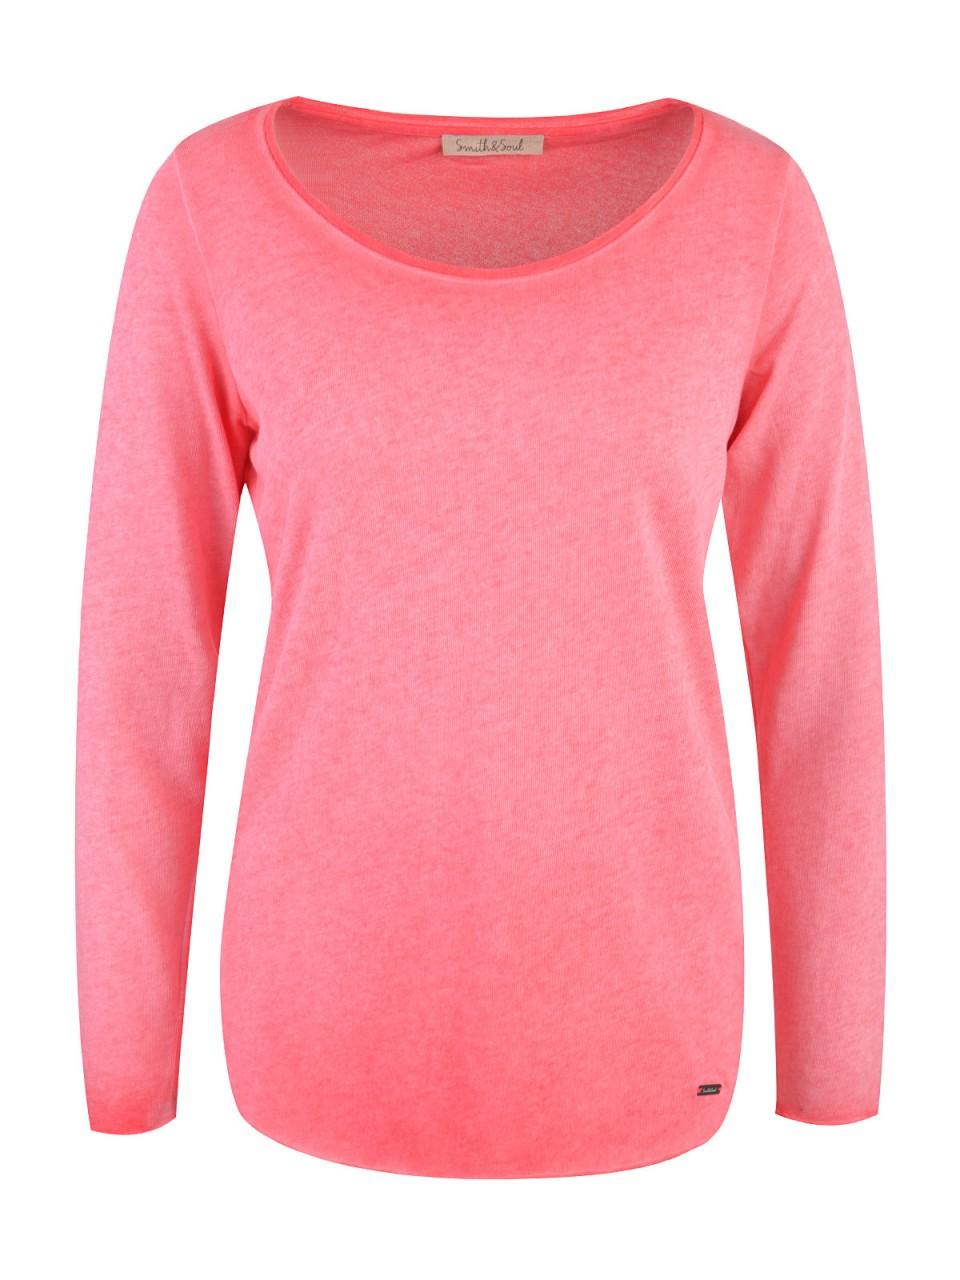 smith-amp-soul-damen-shirt-rosa